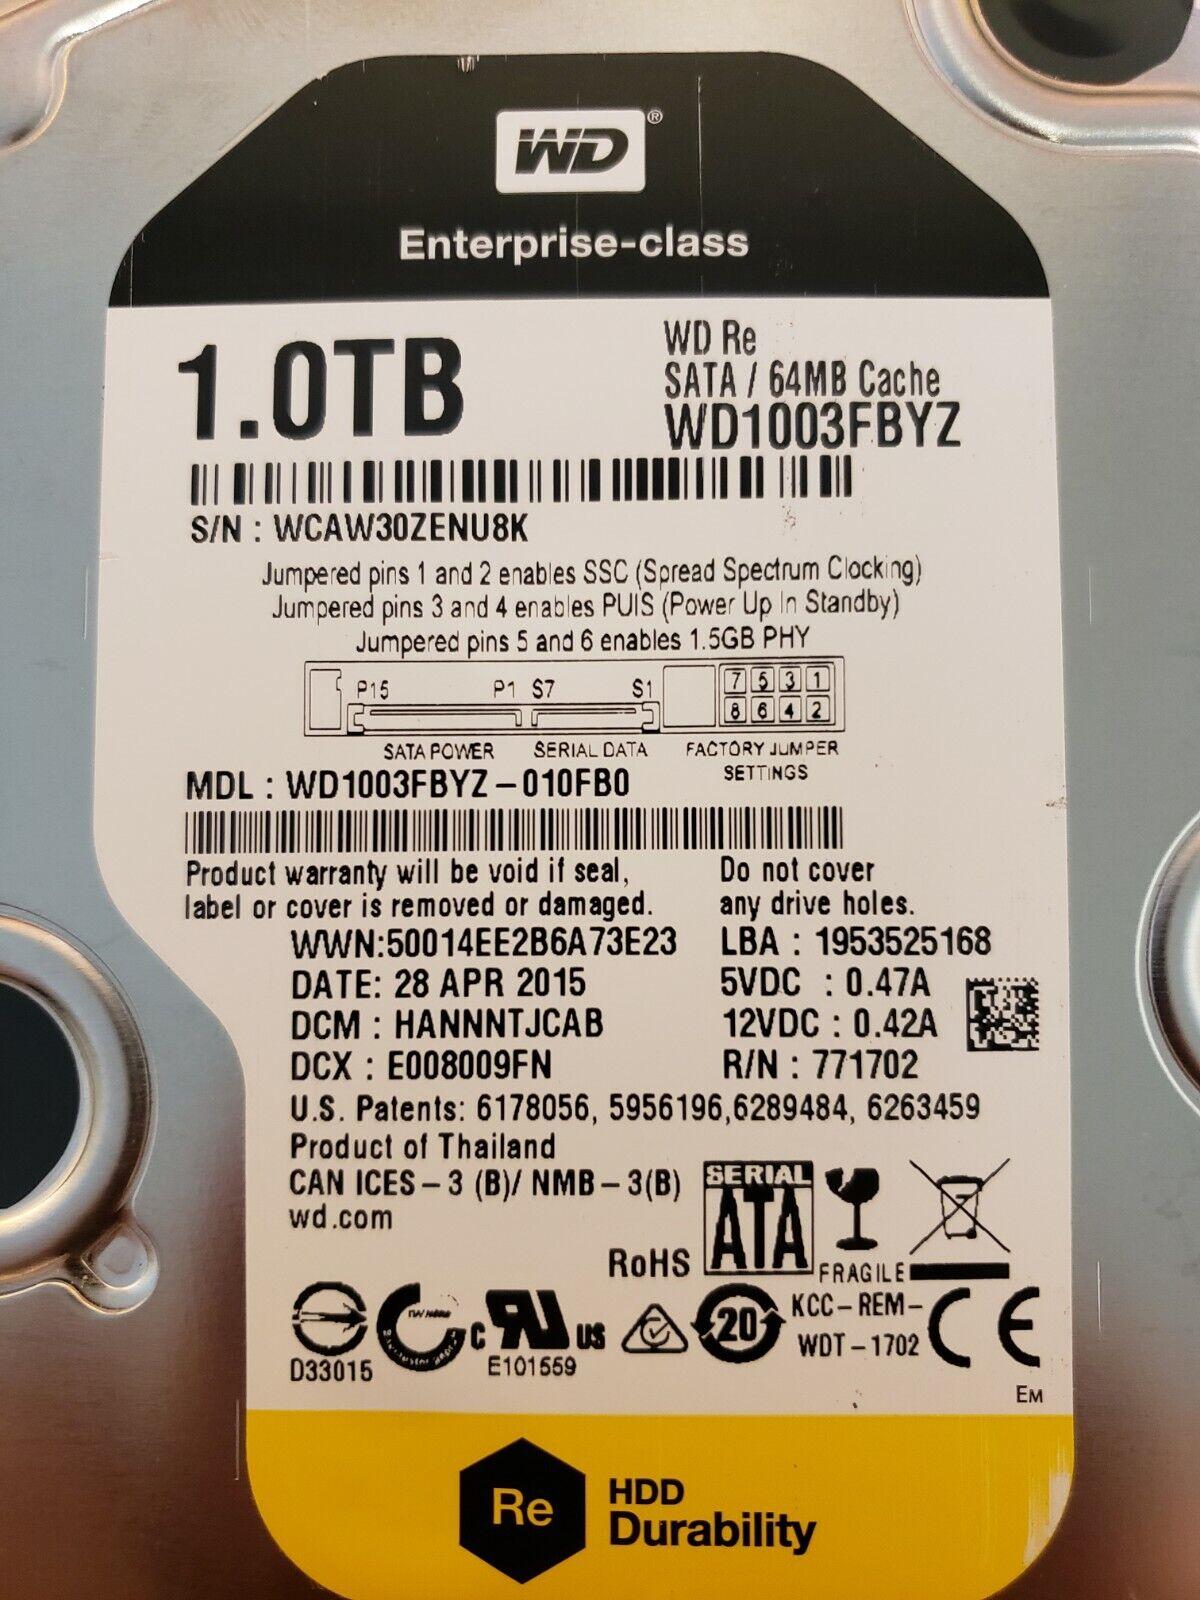 Western Digital WD1003FBYZ – WD RE 1TB Hard Drive – Warranty Expires 07/05/2020